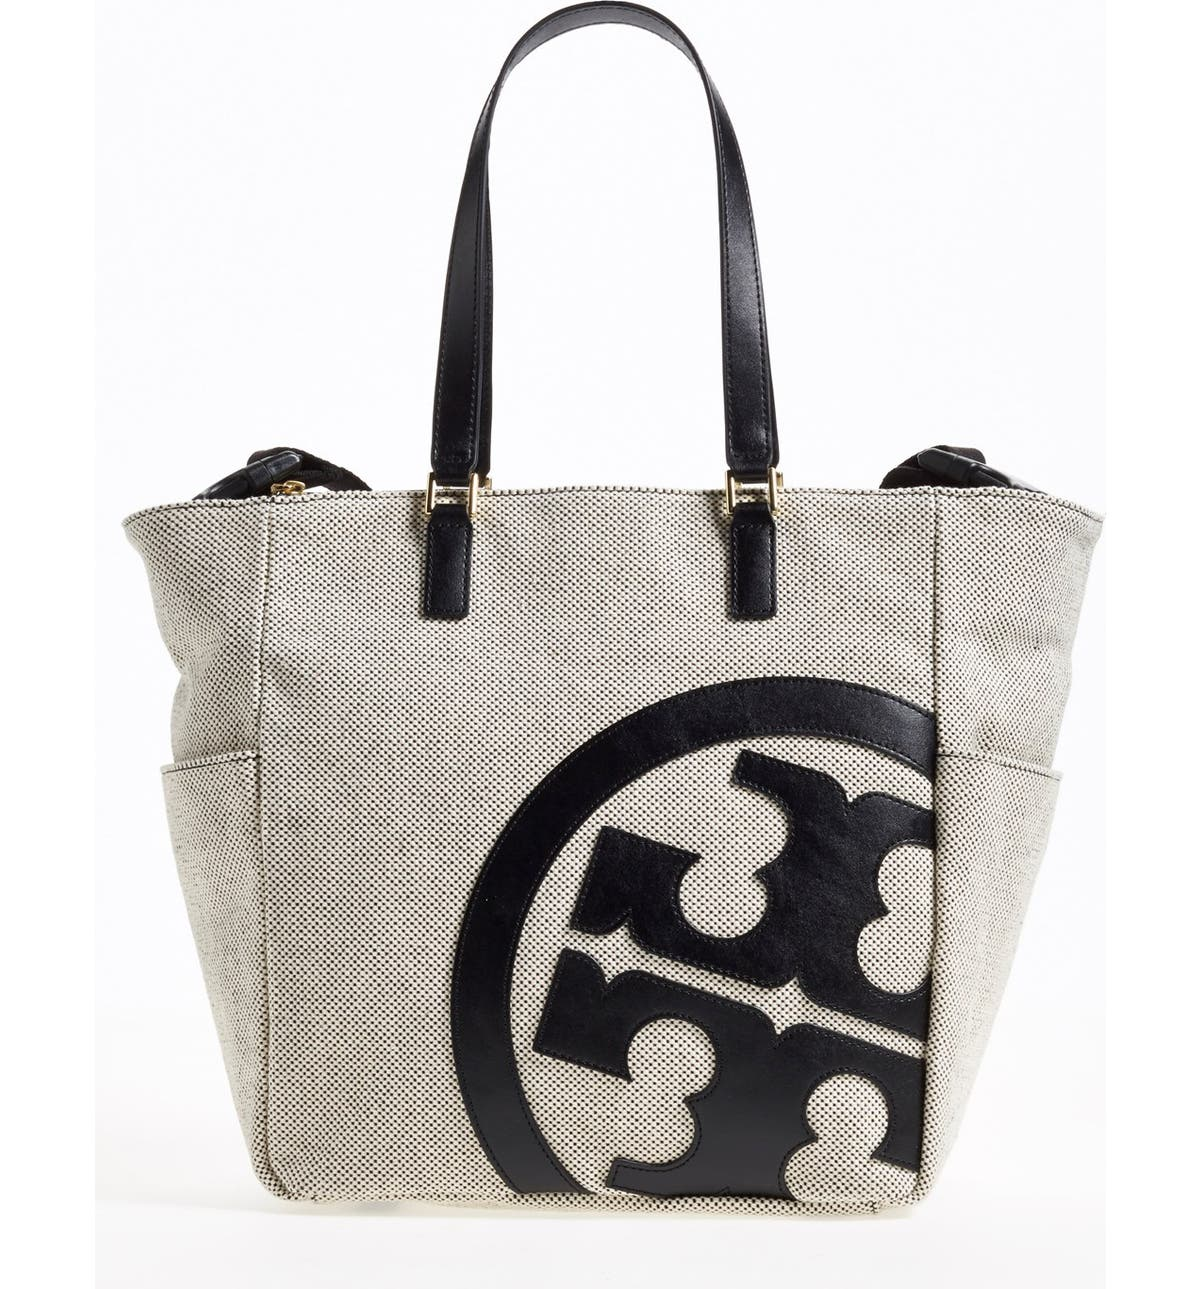 de9b450e26b Tory Burch  Lonnie  Canvas   Leather Baby Bag